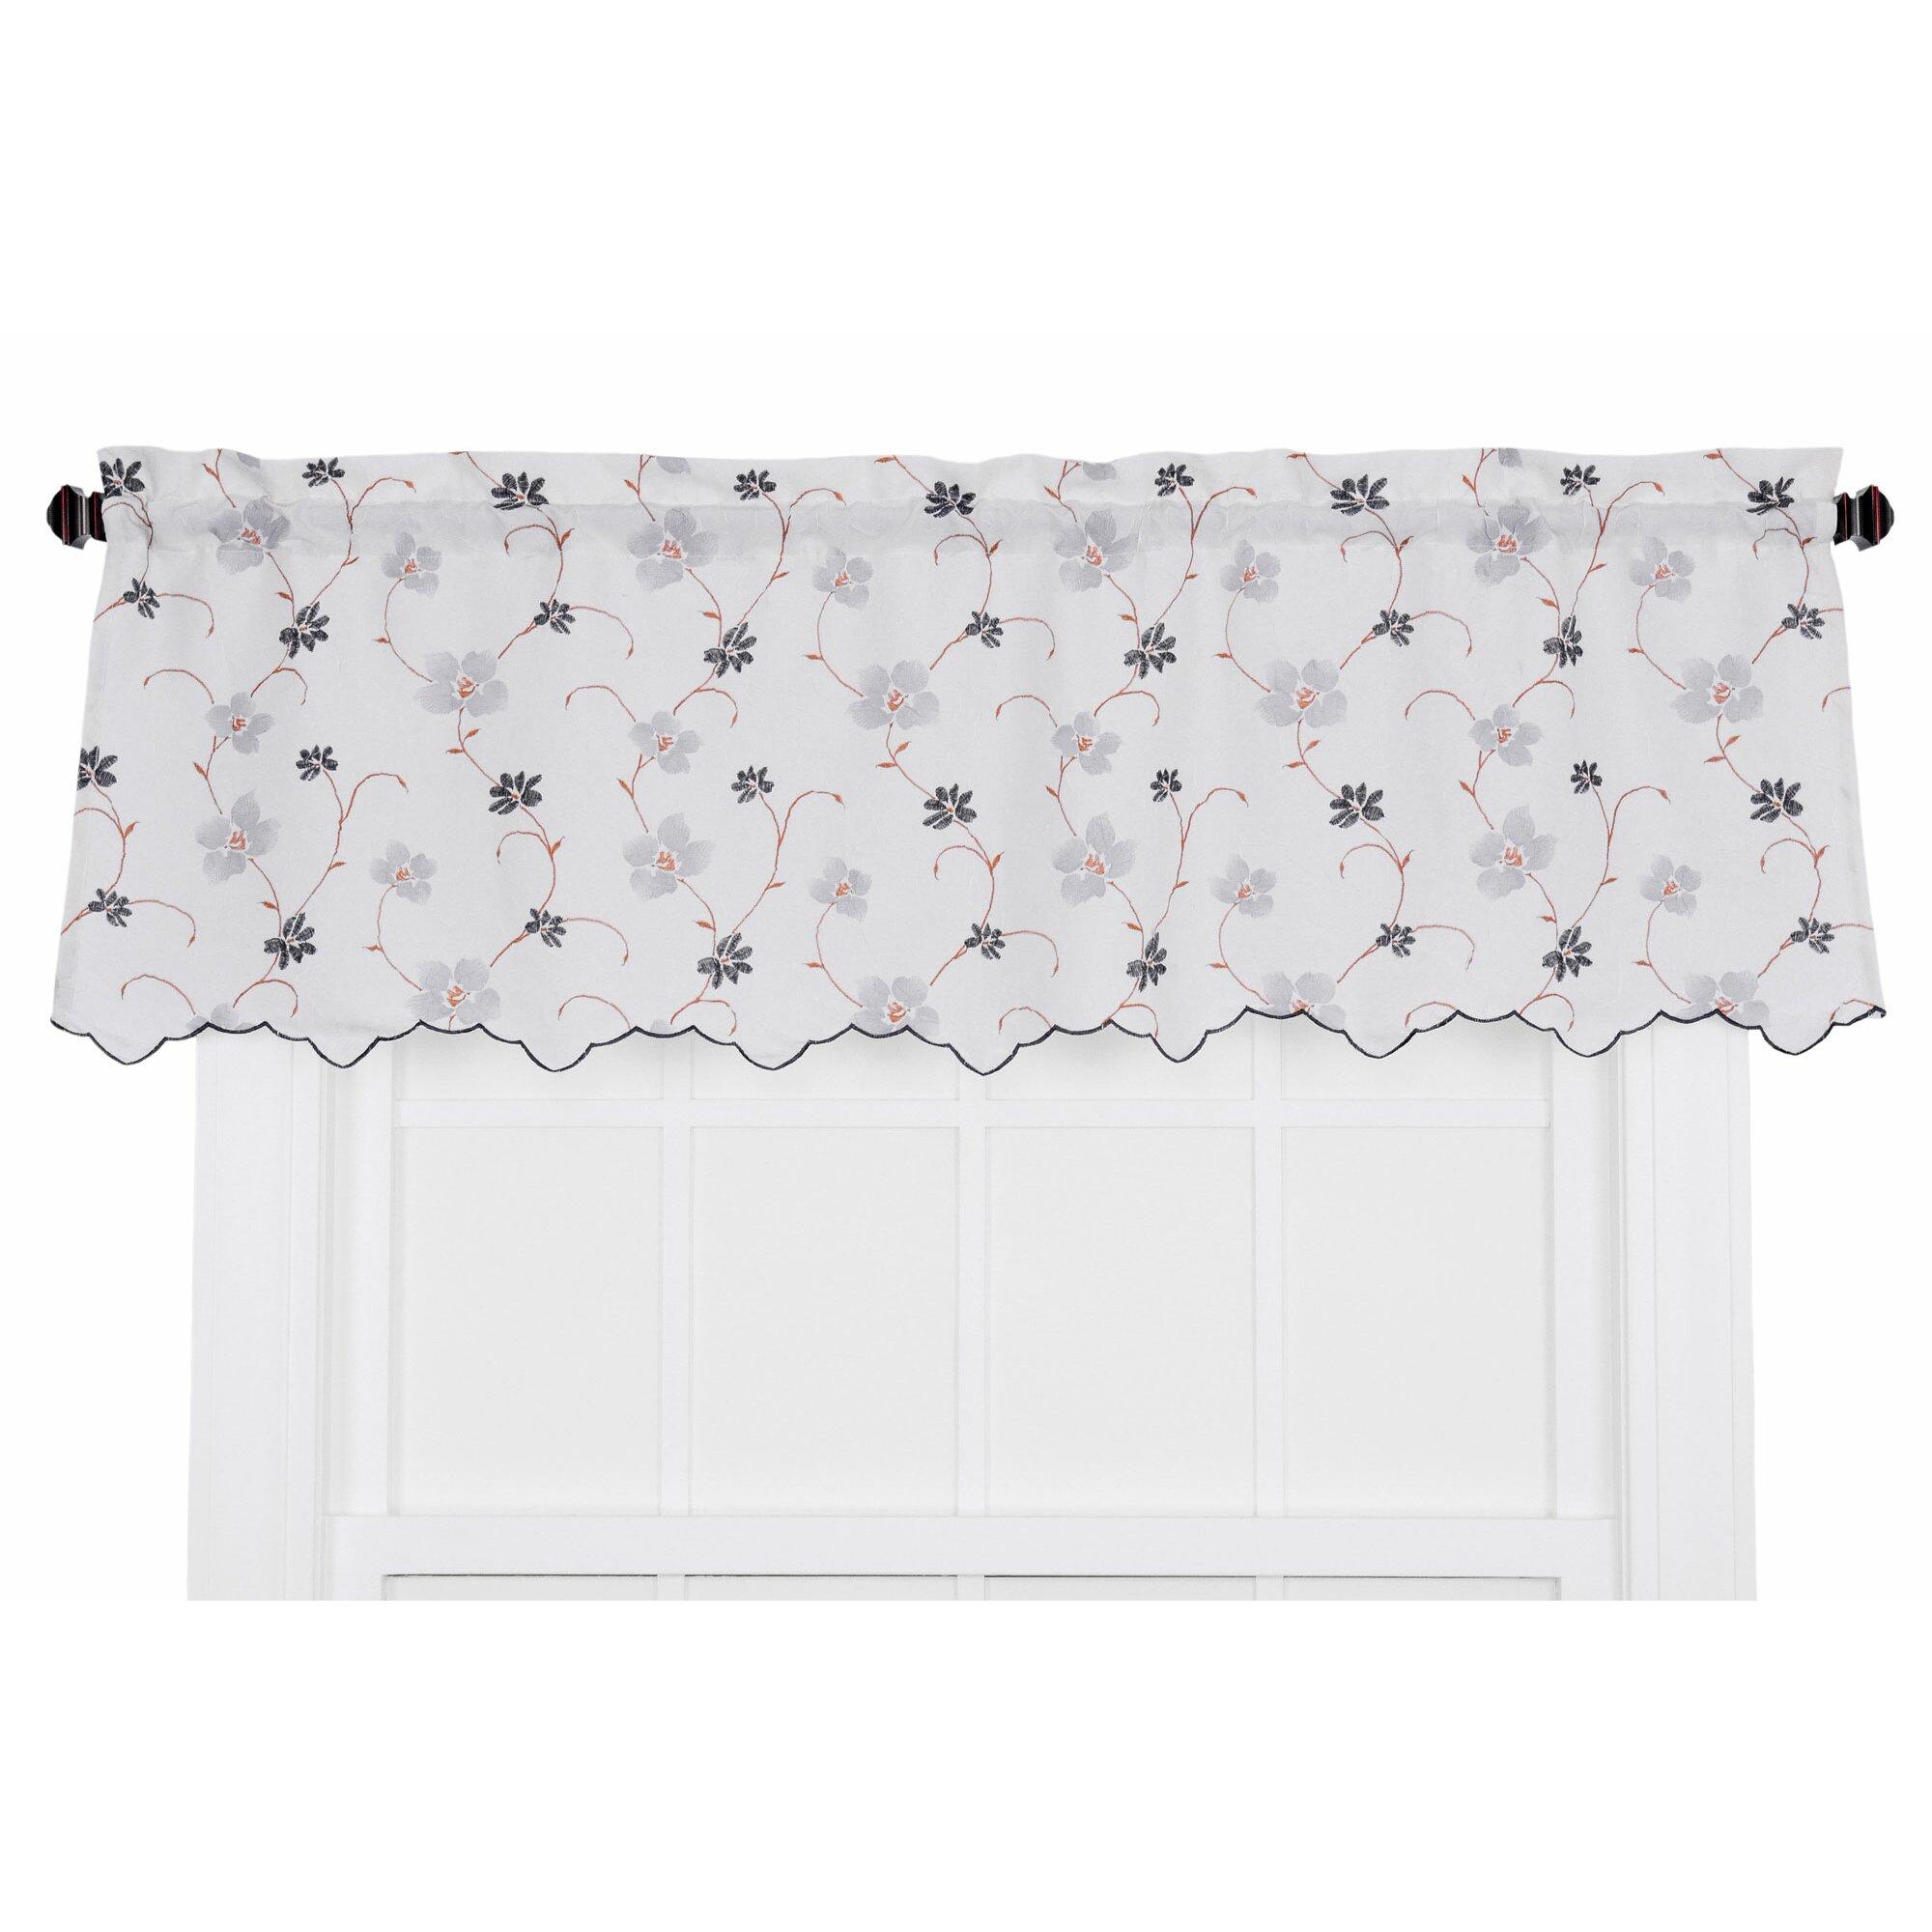 Open black curtain - Ellis Curtain Zoe Crushed Taffeta Open Floral Print Curtain Valance